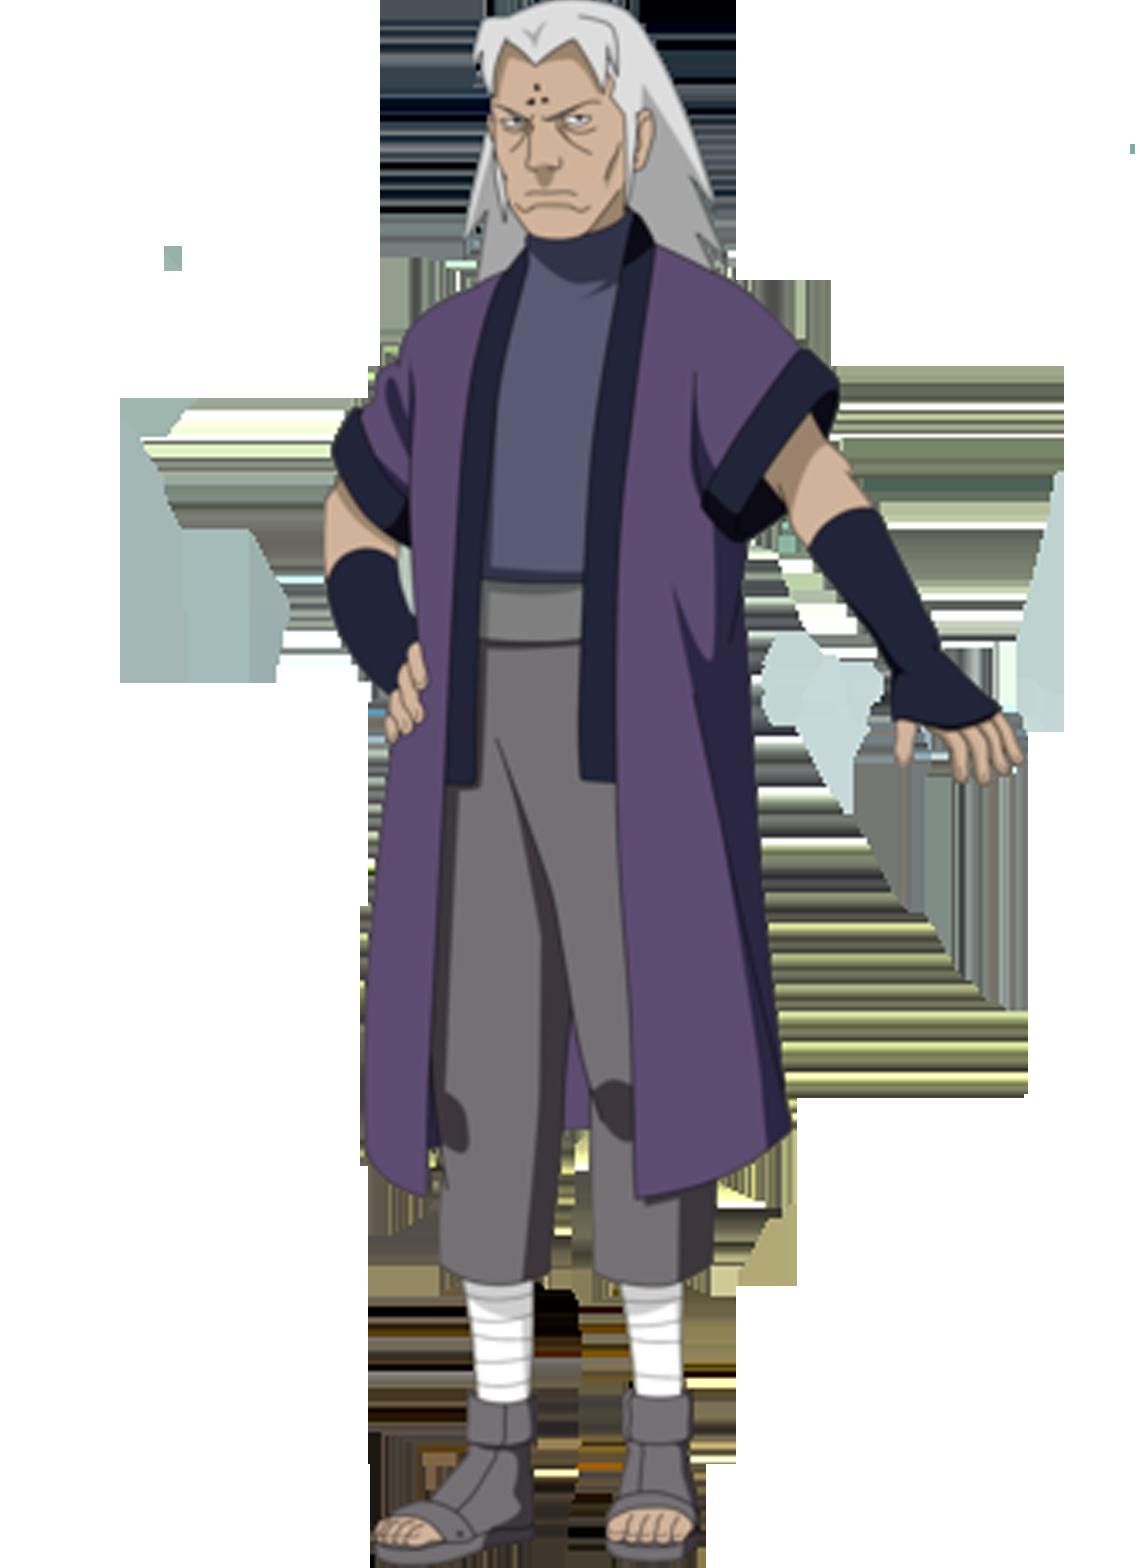 Agira Ryudoin   Anime naruto, Naruto characters, Naruto